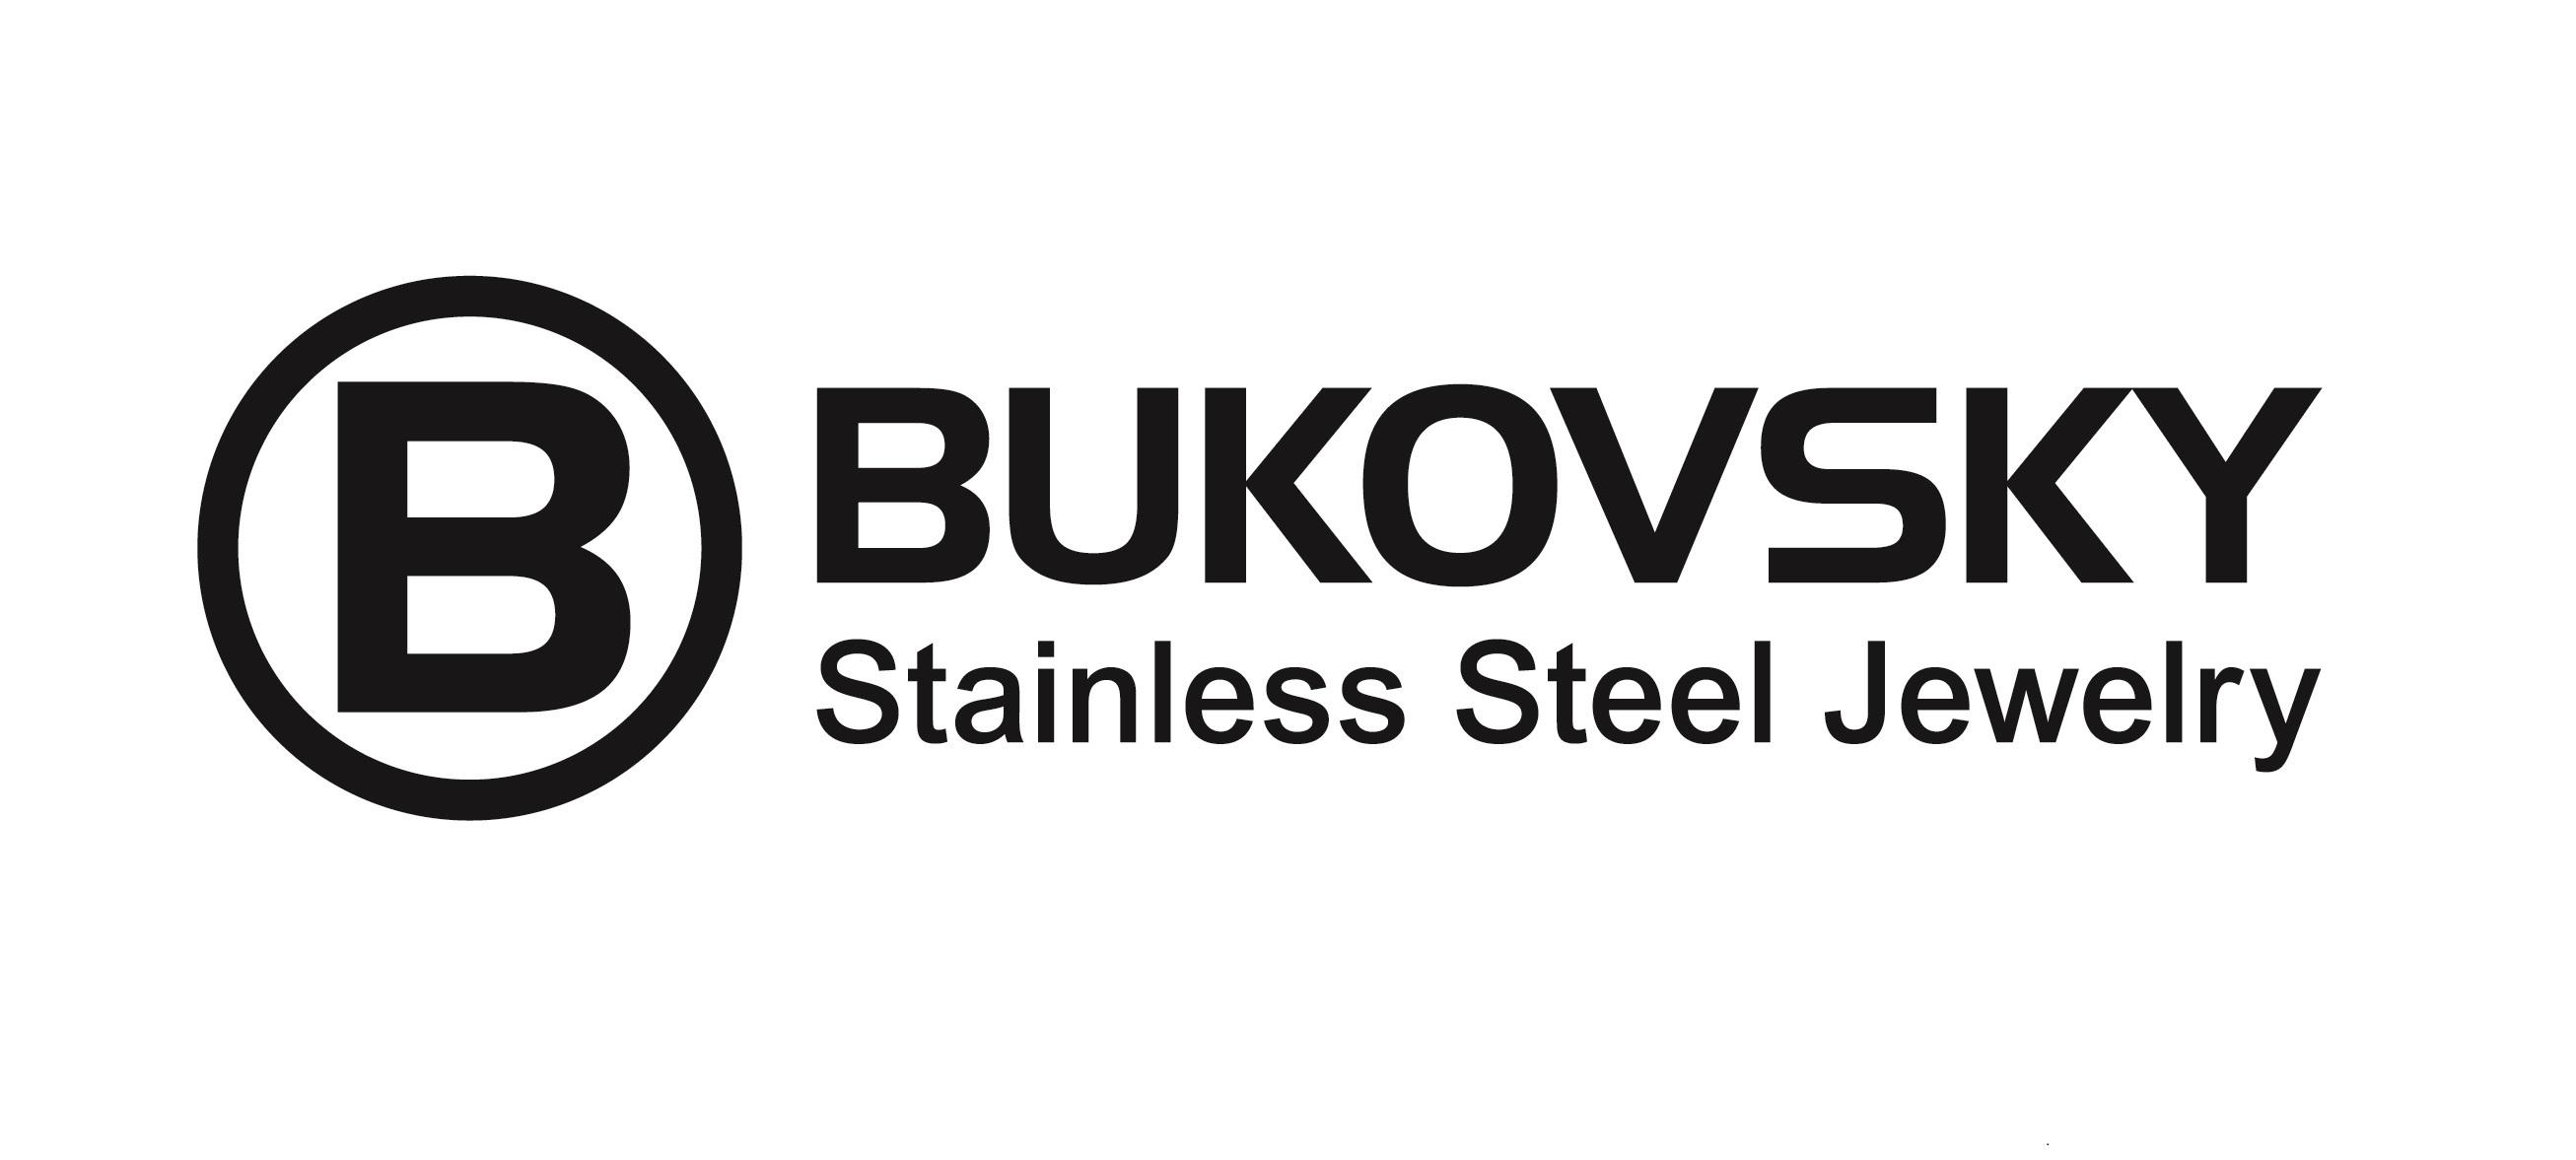 "Roestvrij Stalen Bukovsky Heren Armband ""Prestige XL"" - Geborsteld / Mat - Rvs - Bukovsky.nl"